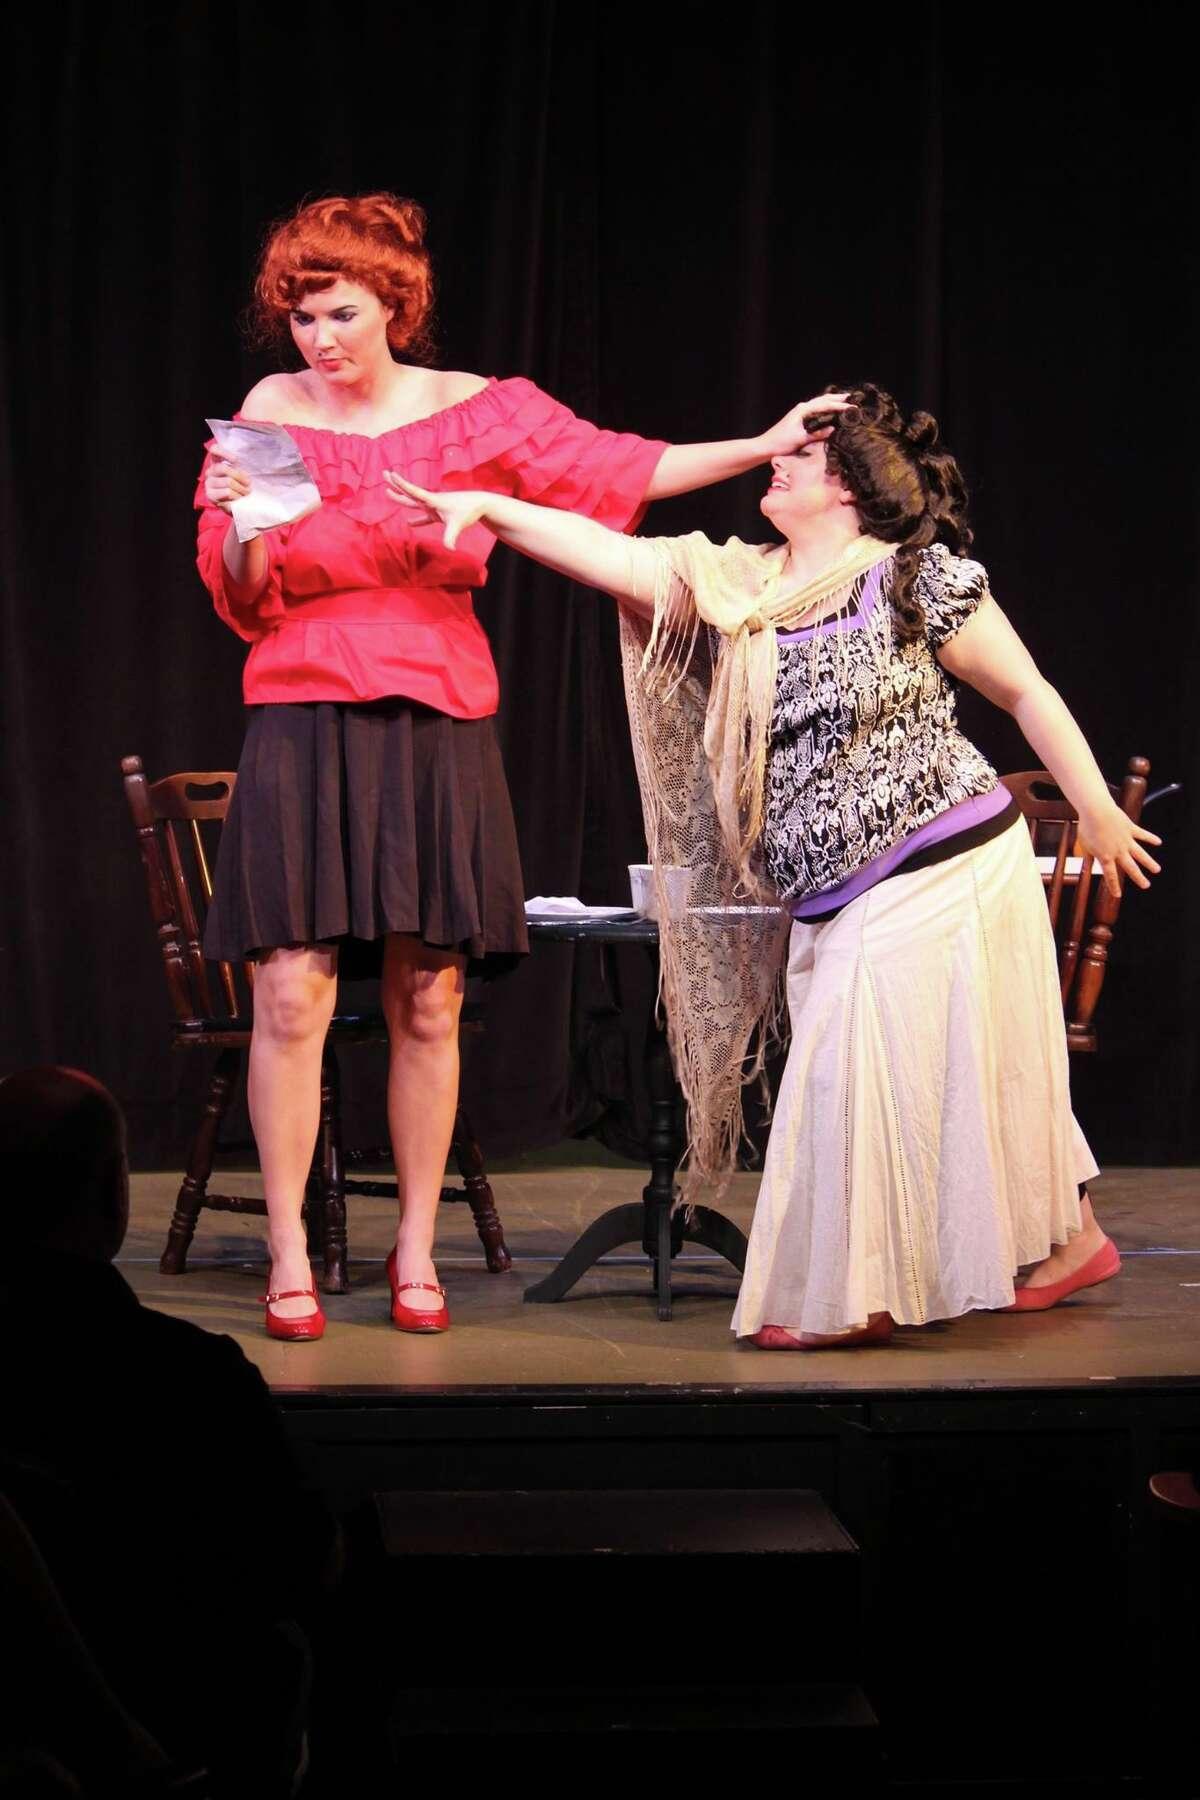 Megan Nix, left, keeps Cindy Lou Parker at arms length in